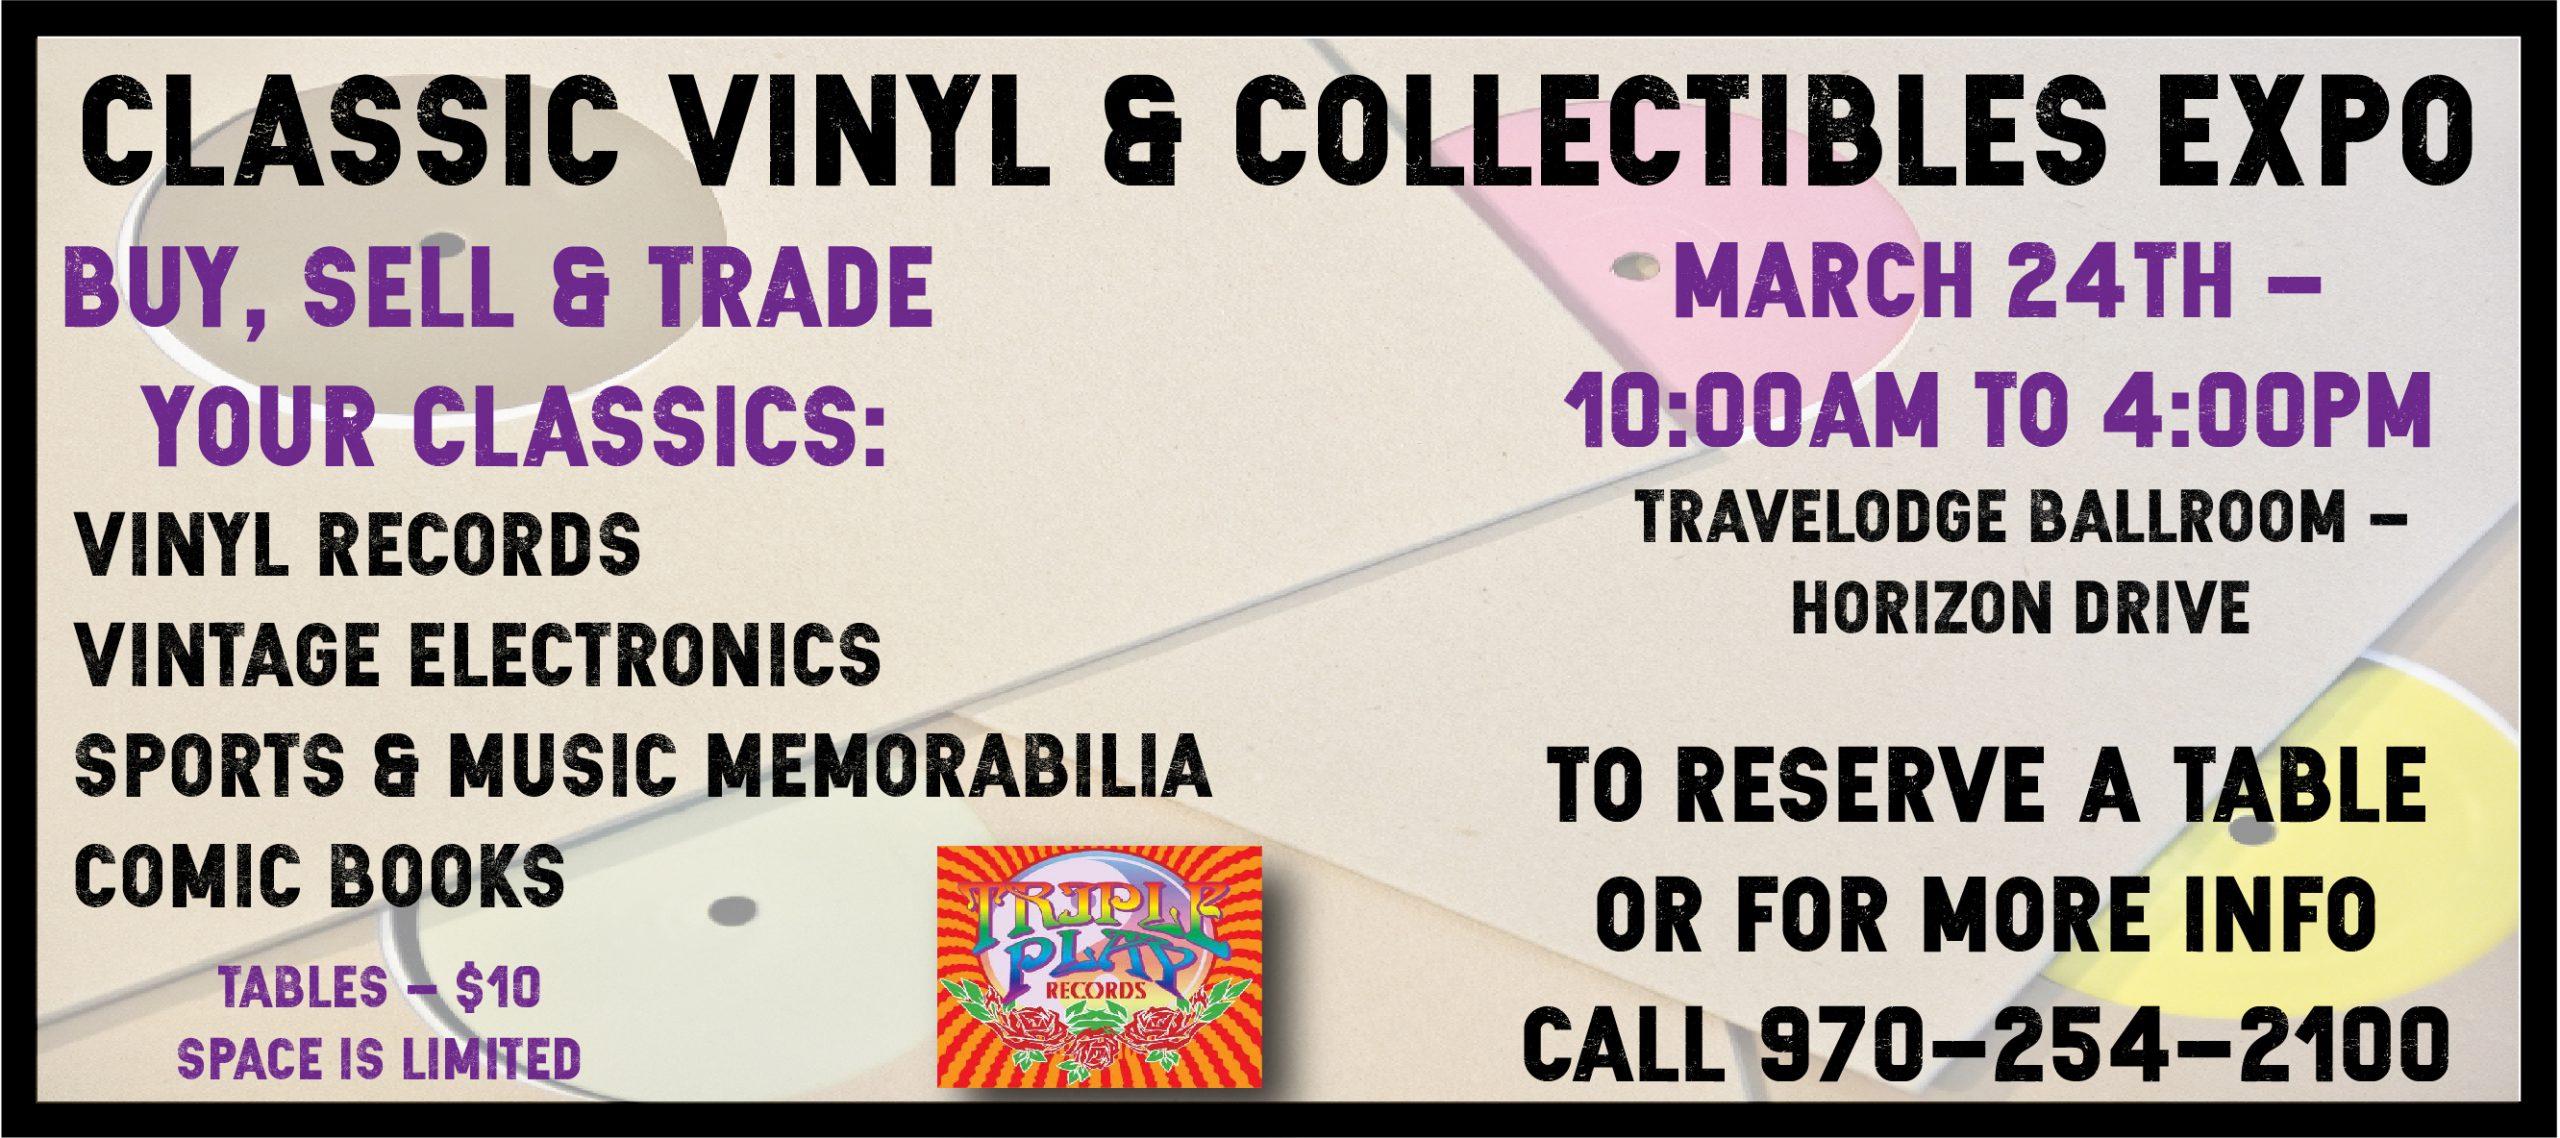 Feature: http://www.961kstr.com/classic-vinyl-collectible-expo/